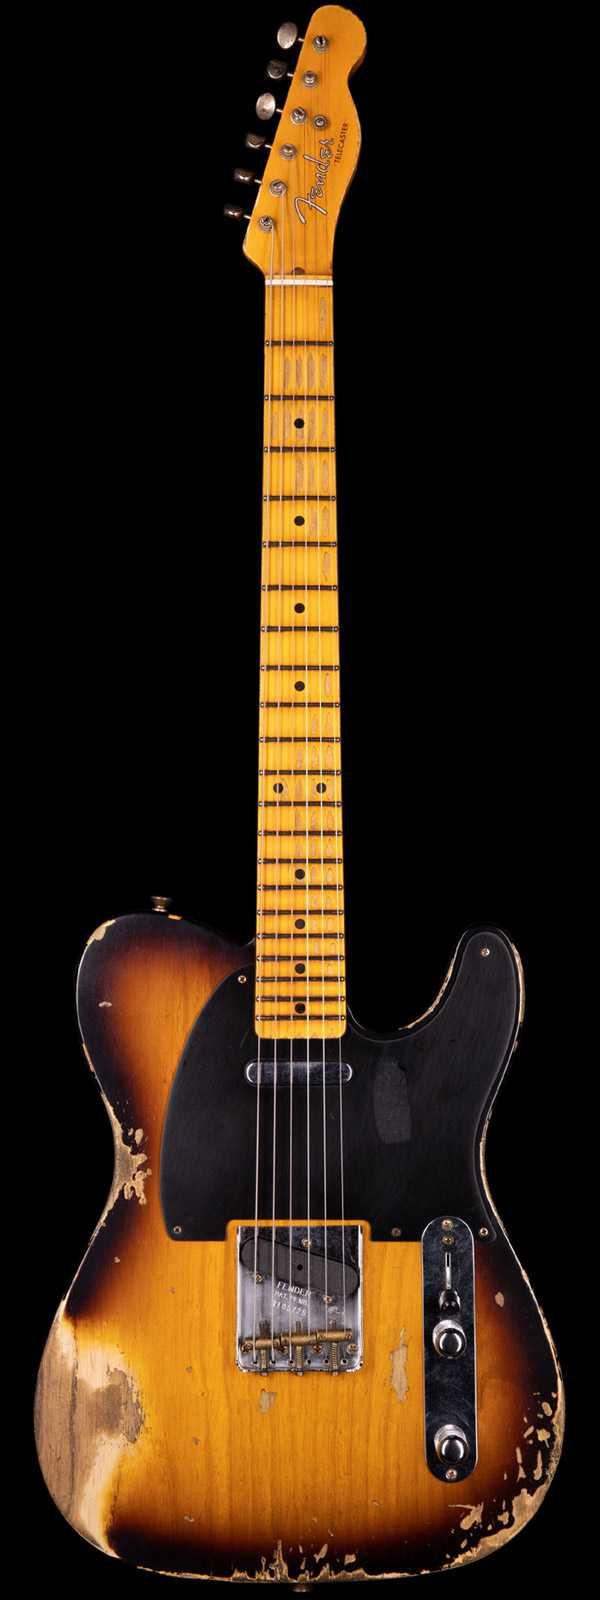 Fender Custom Shop 1952 Telecaster Heavy Relic 2-Tone Sunburst